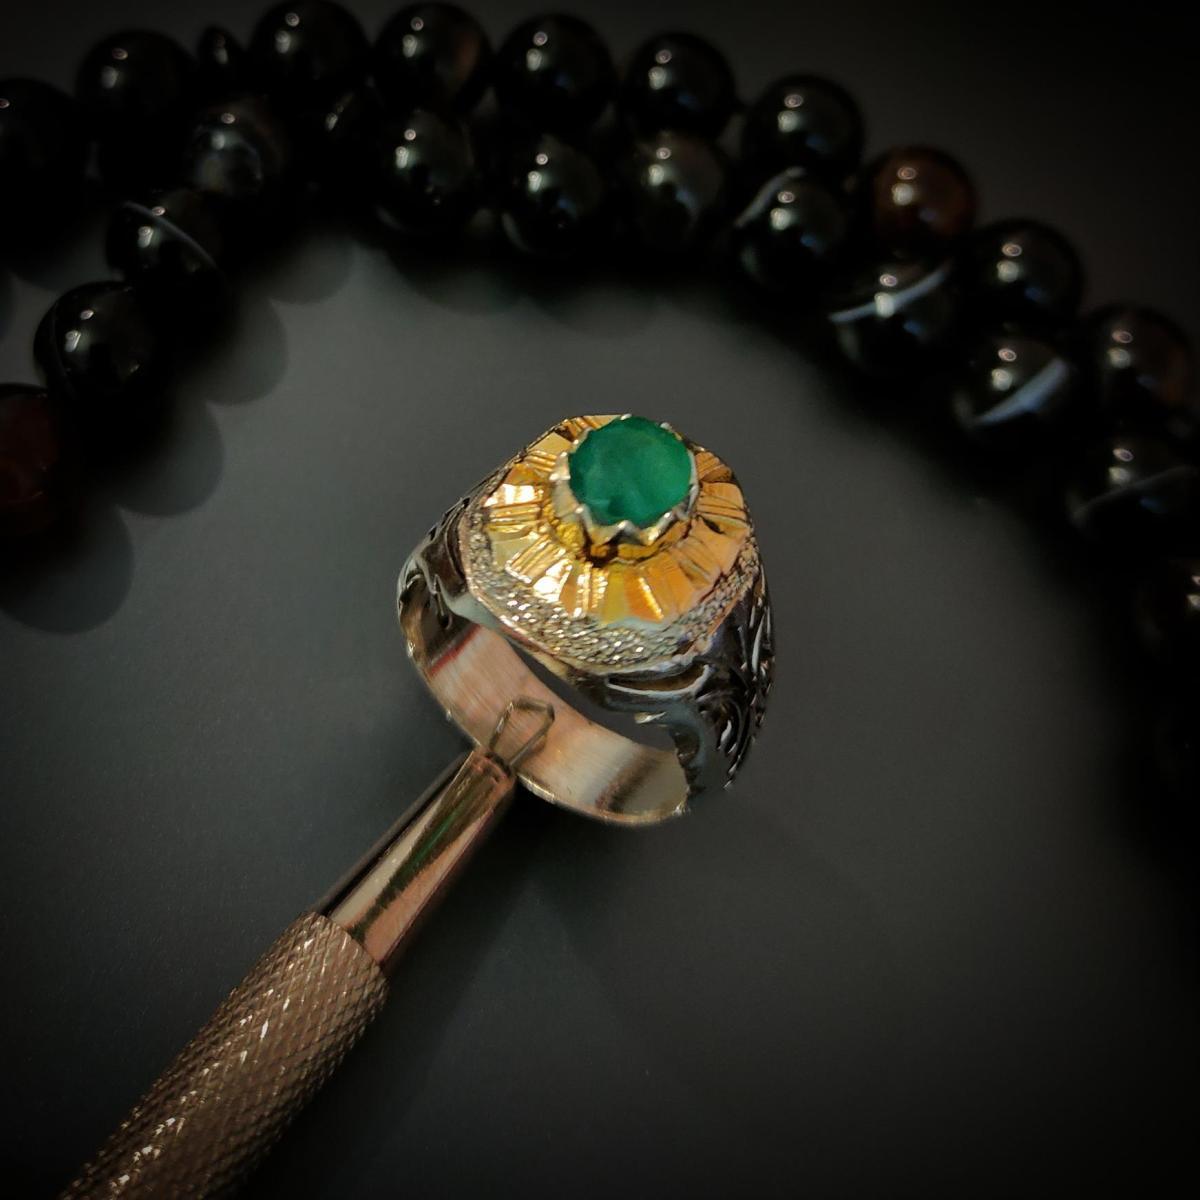 Natural Emerald Ring Handmade 925 Silver Zambian Emerald Zamurd Ring 5 natural gemstones pakistan + 925 silver jewelry online